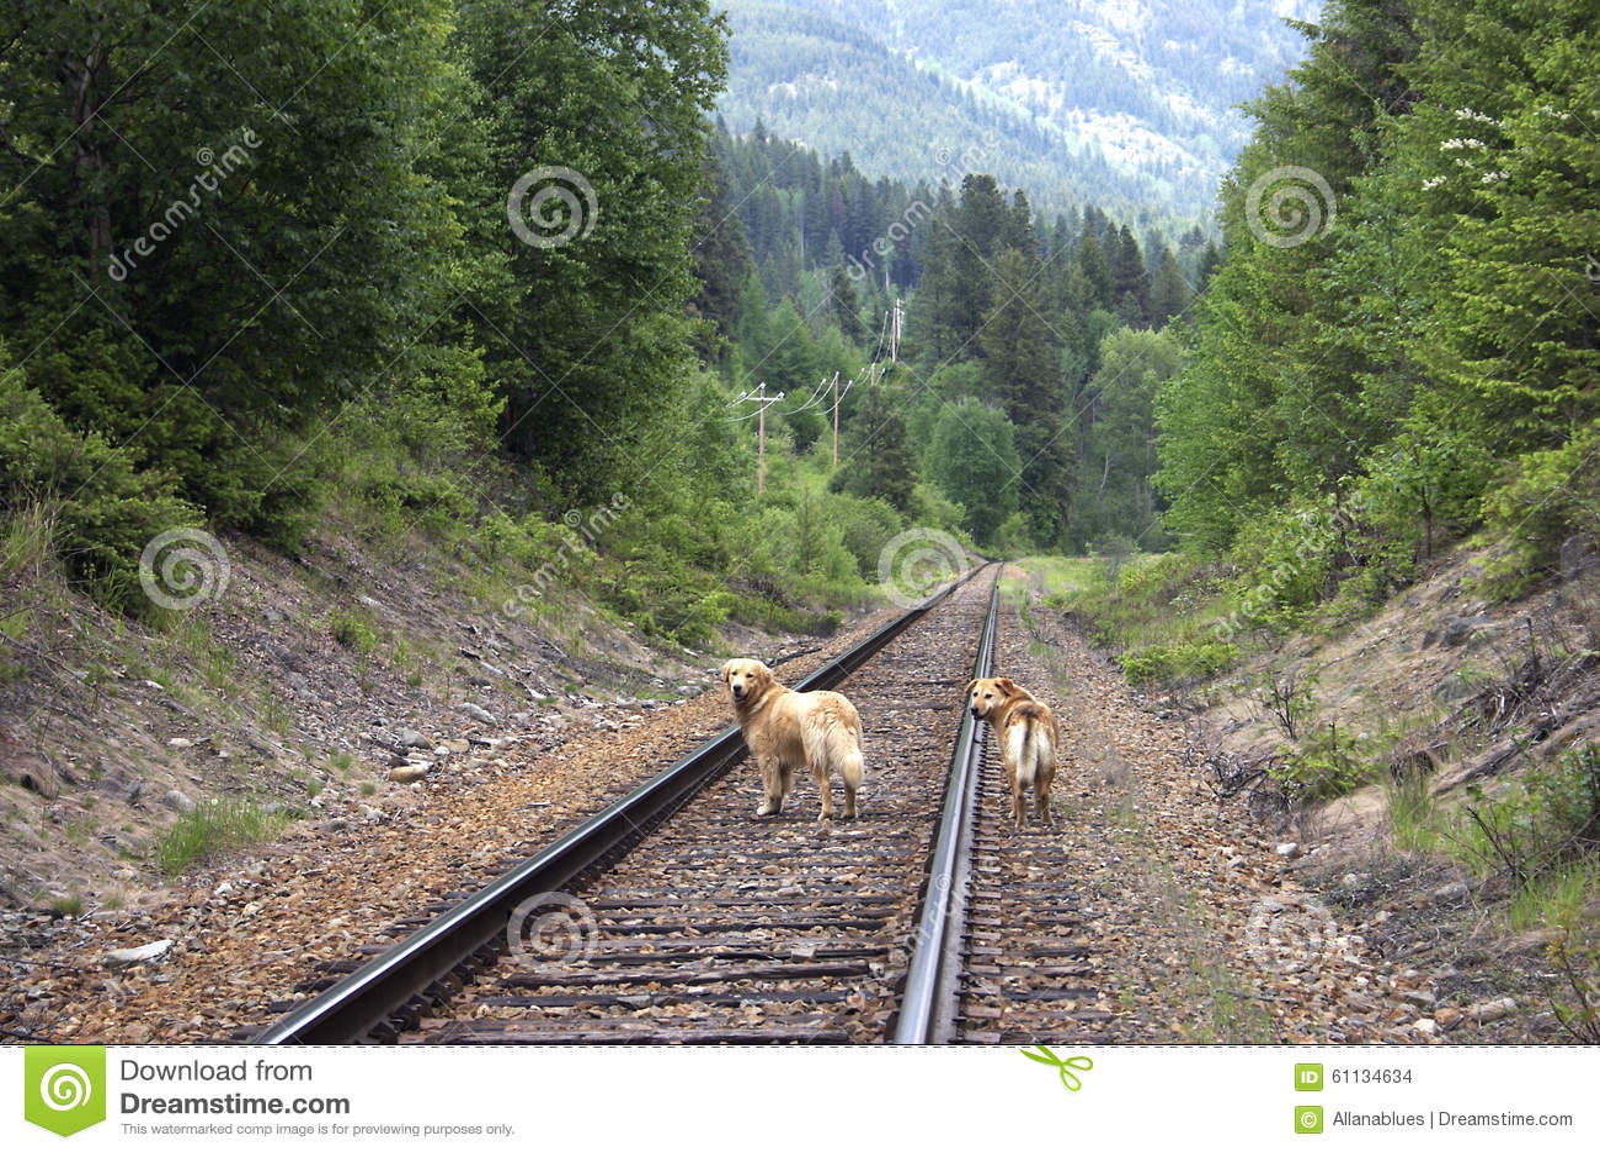 Dogs on railroad tracks stock photo. Image of walking